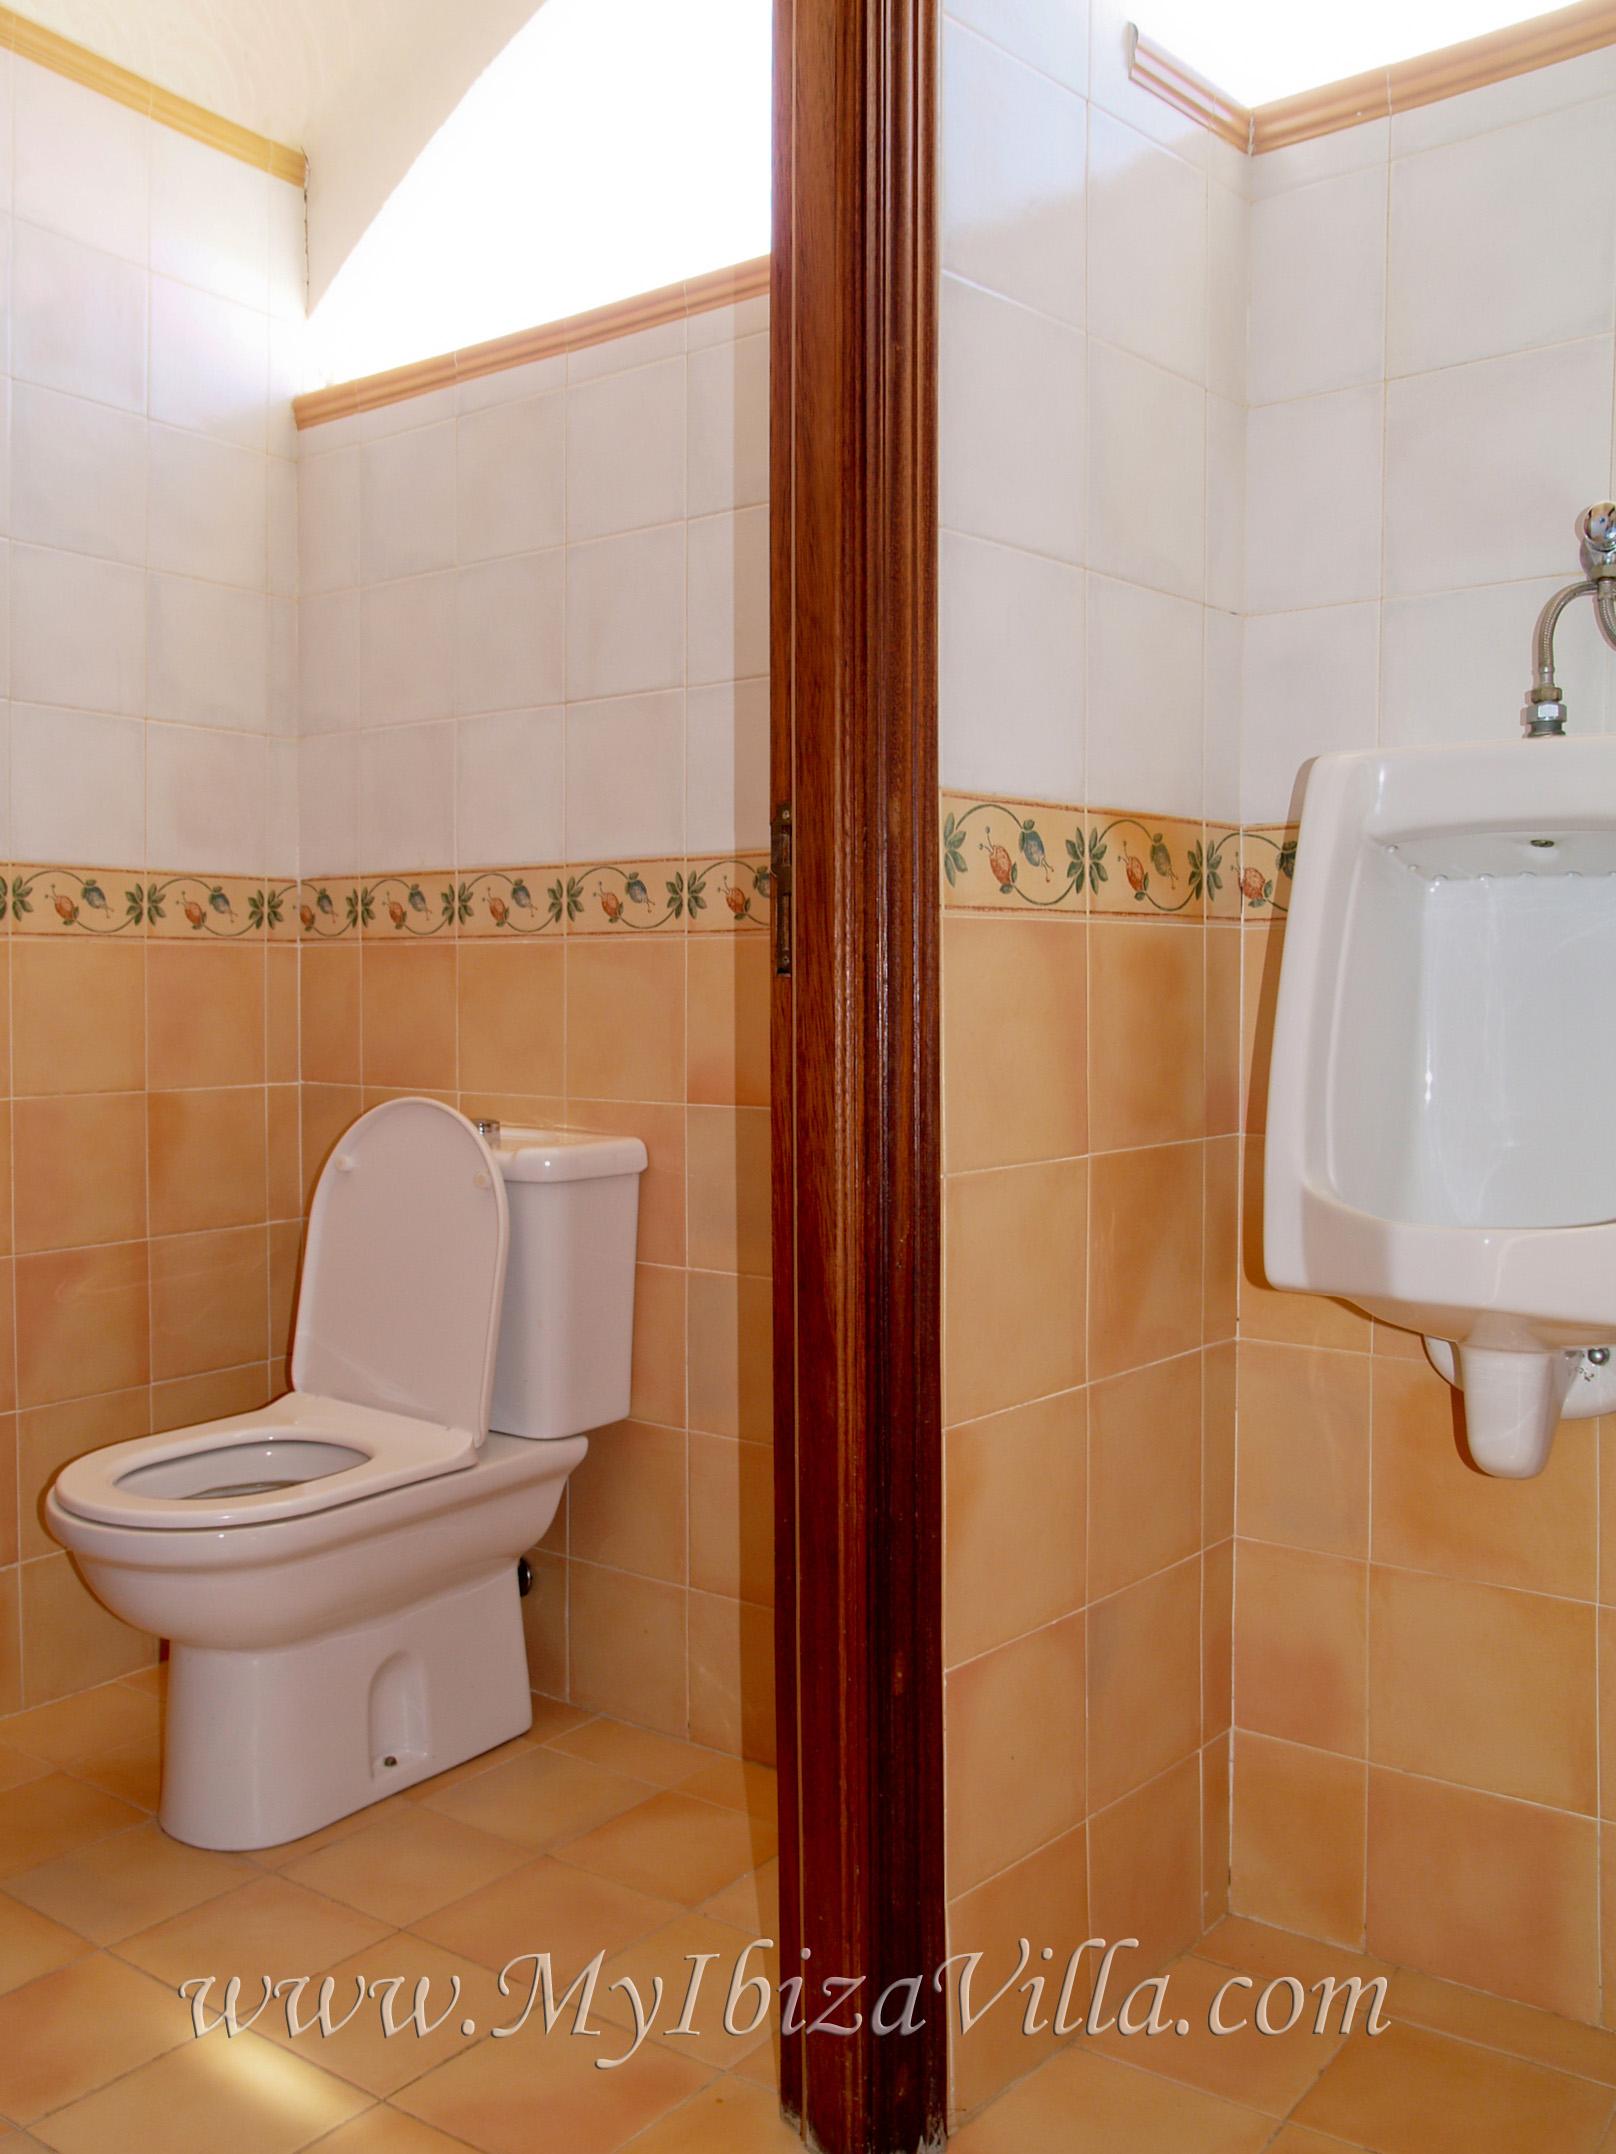 ibiza villa 3rd bathroom 2wc